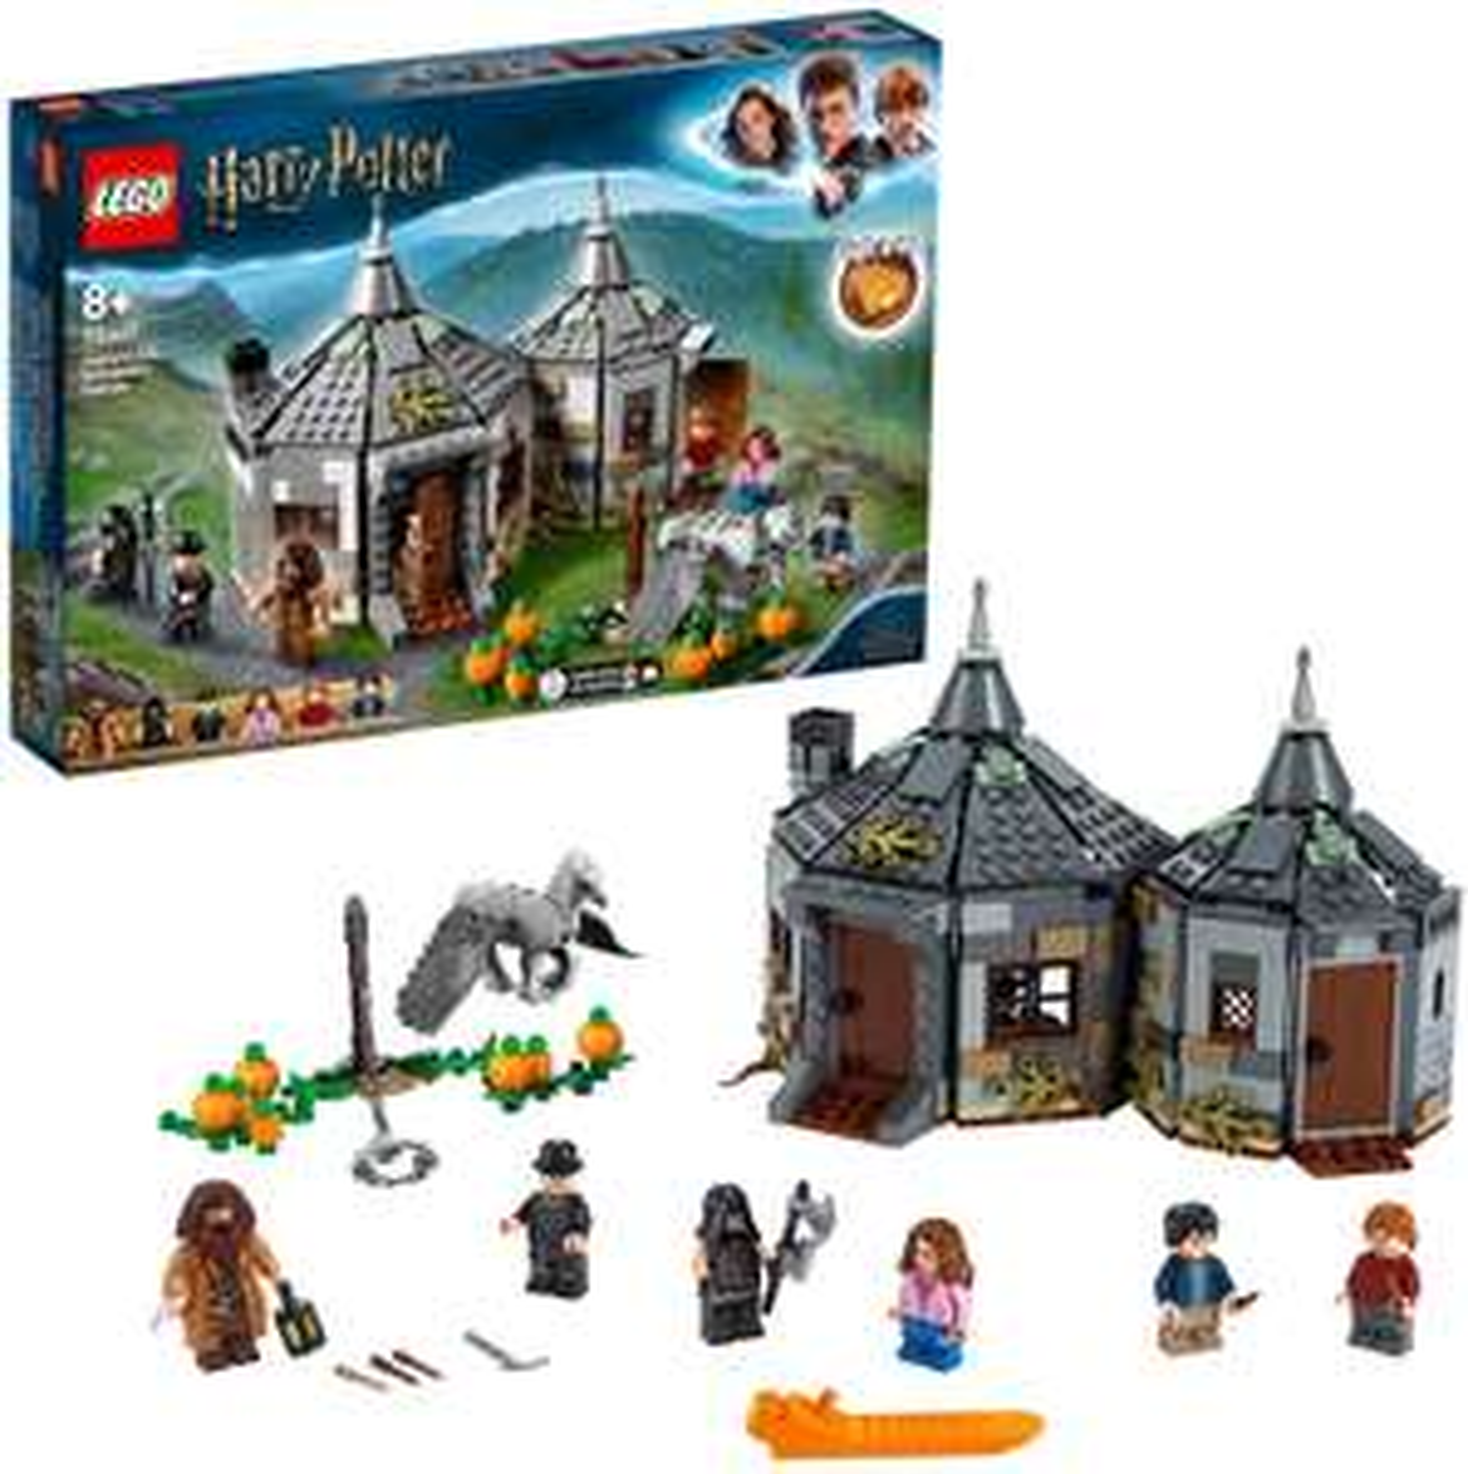 Lego Harry Potter 75947 - La Cabane de Hagrid : le Sauvetage de Buck